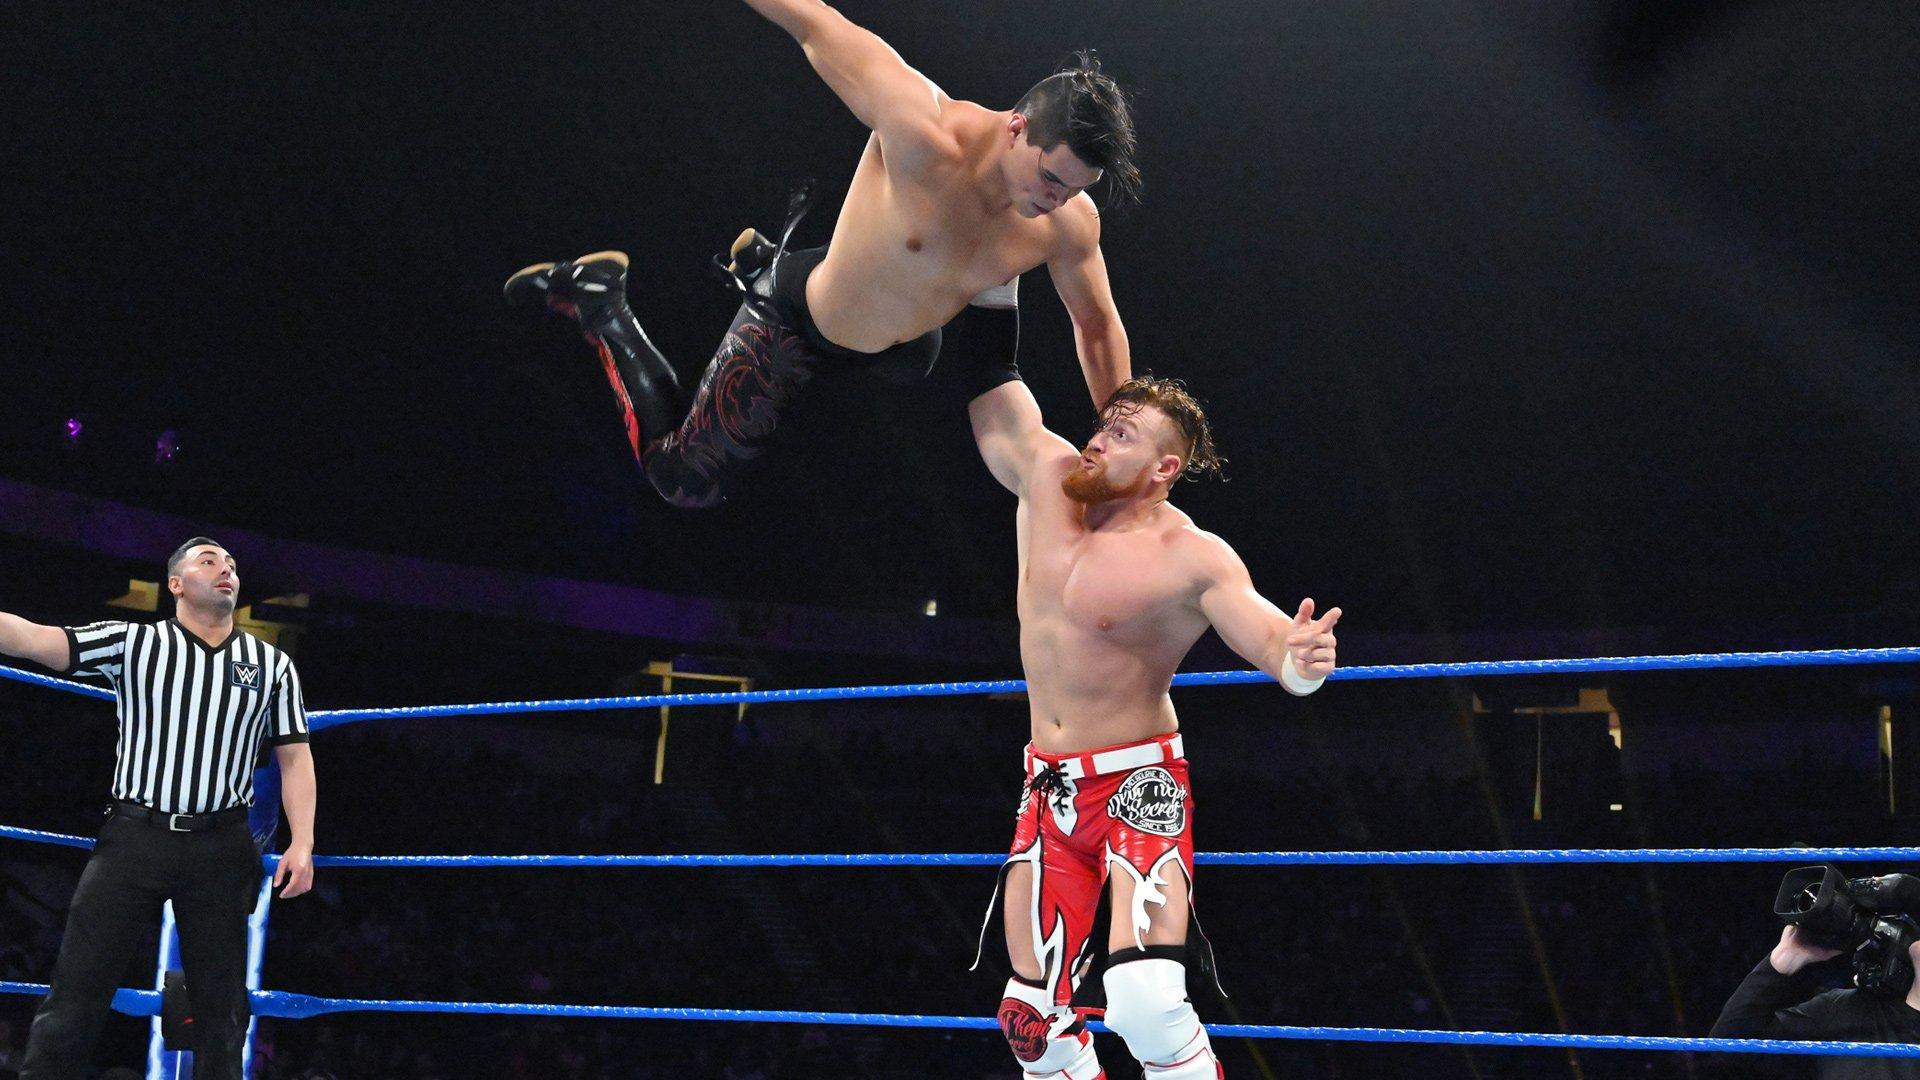 Humberto Carrillo vs. Buddy Murphy: WWE 205 Live, 15 Janvier 2019